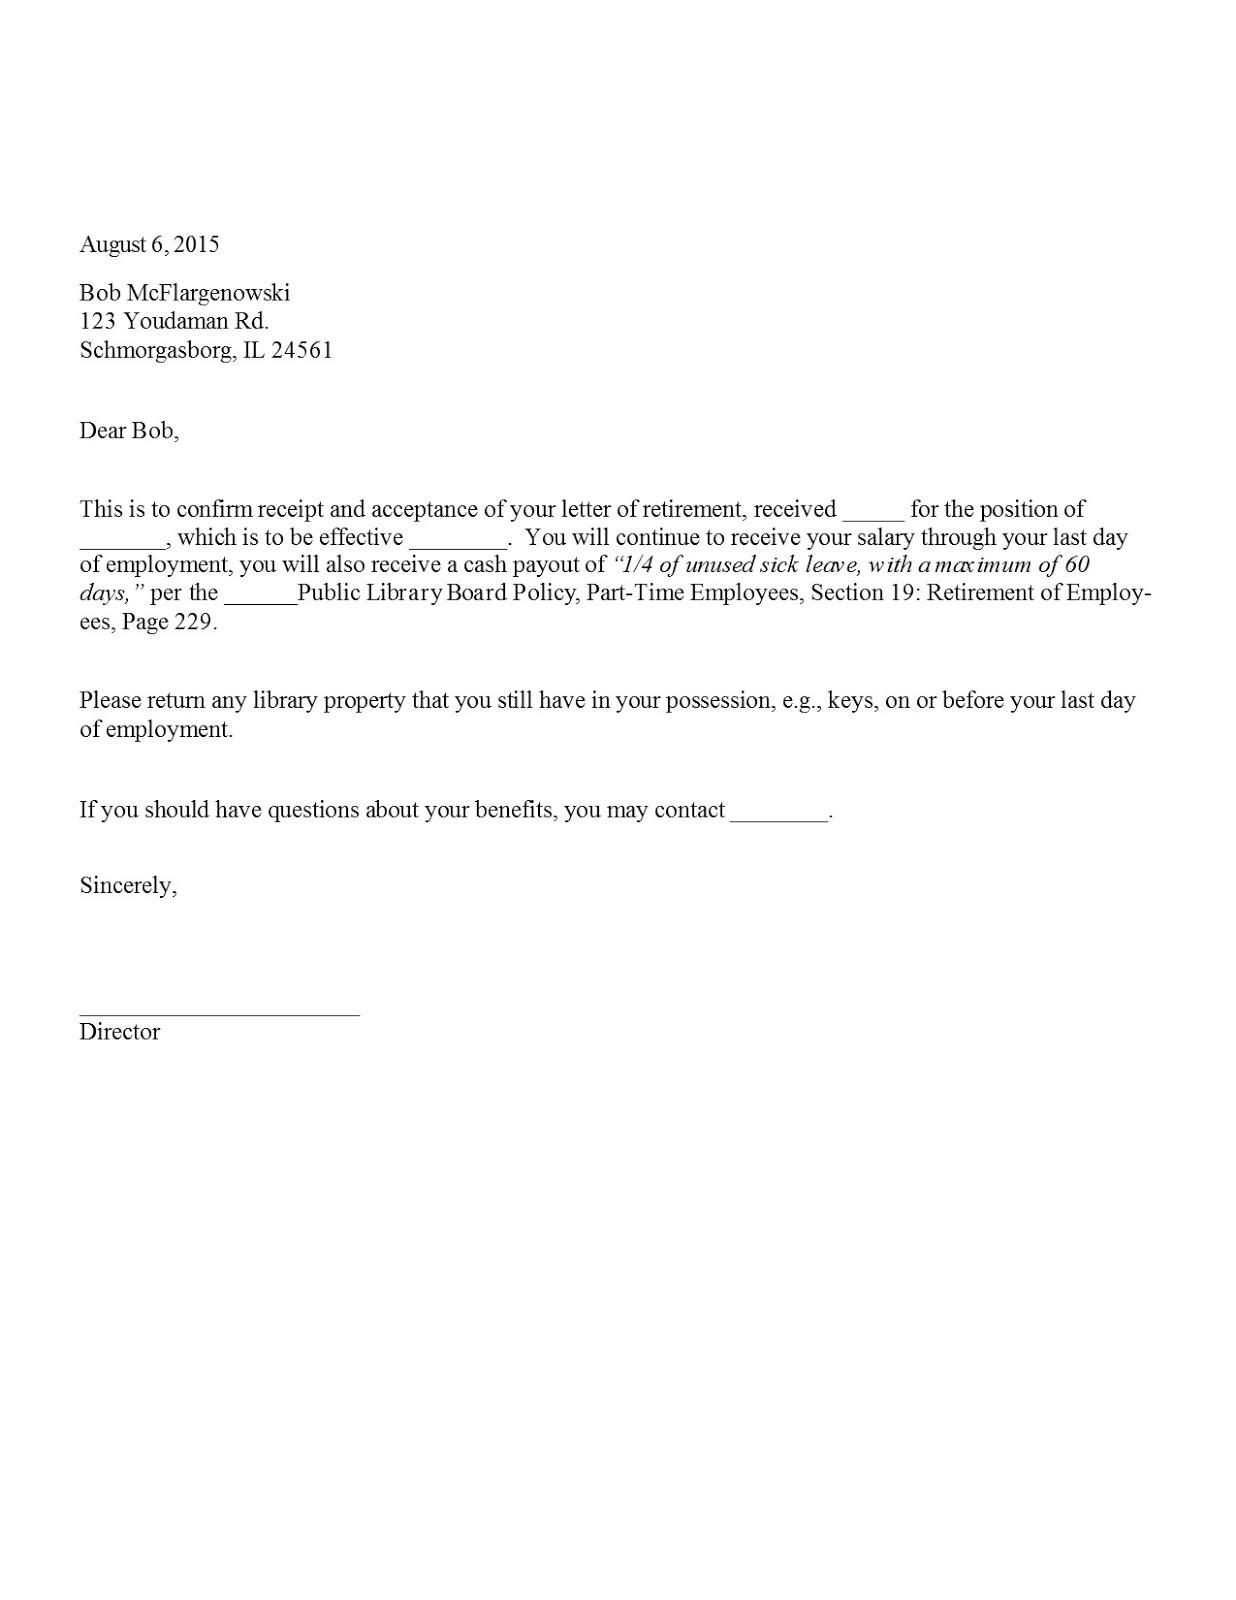 sample retirement acceptance letter